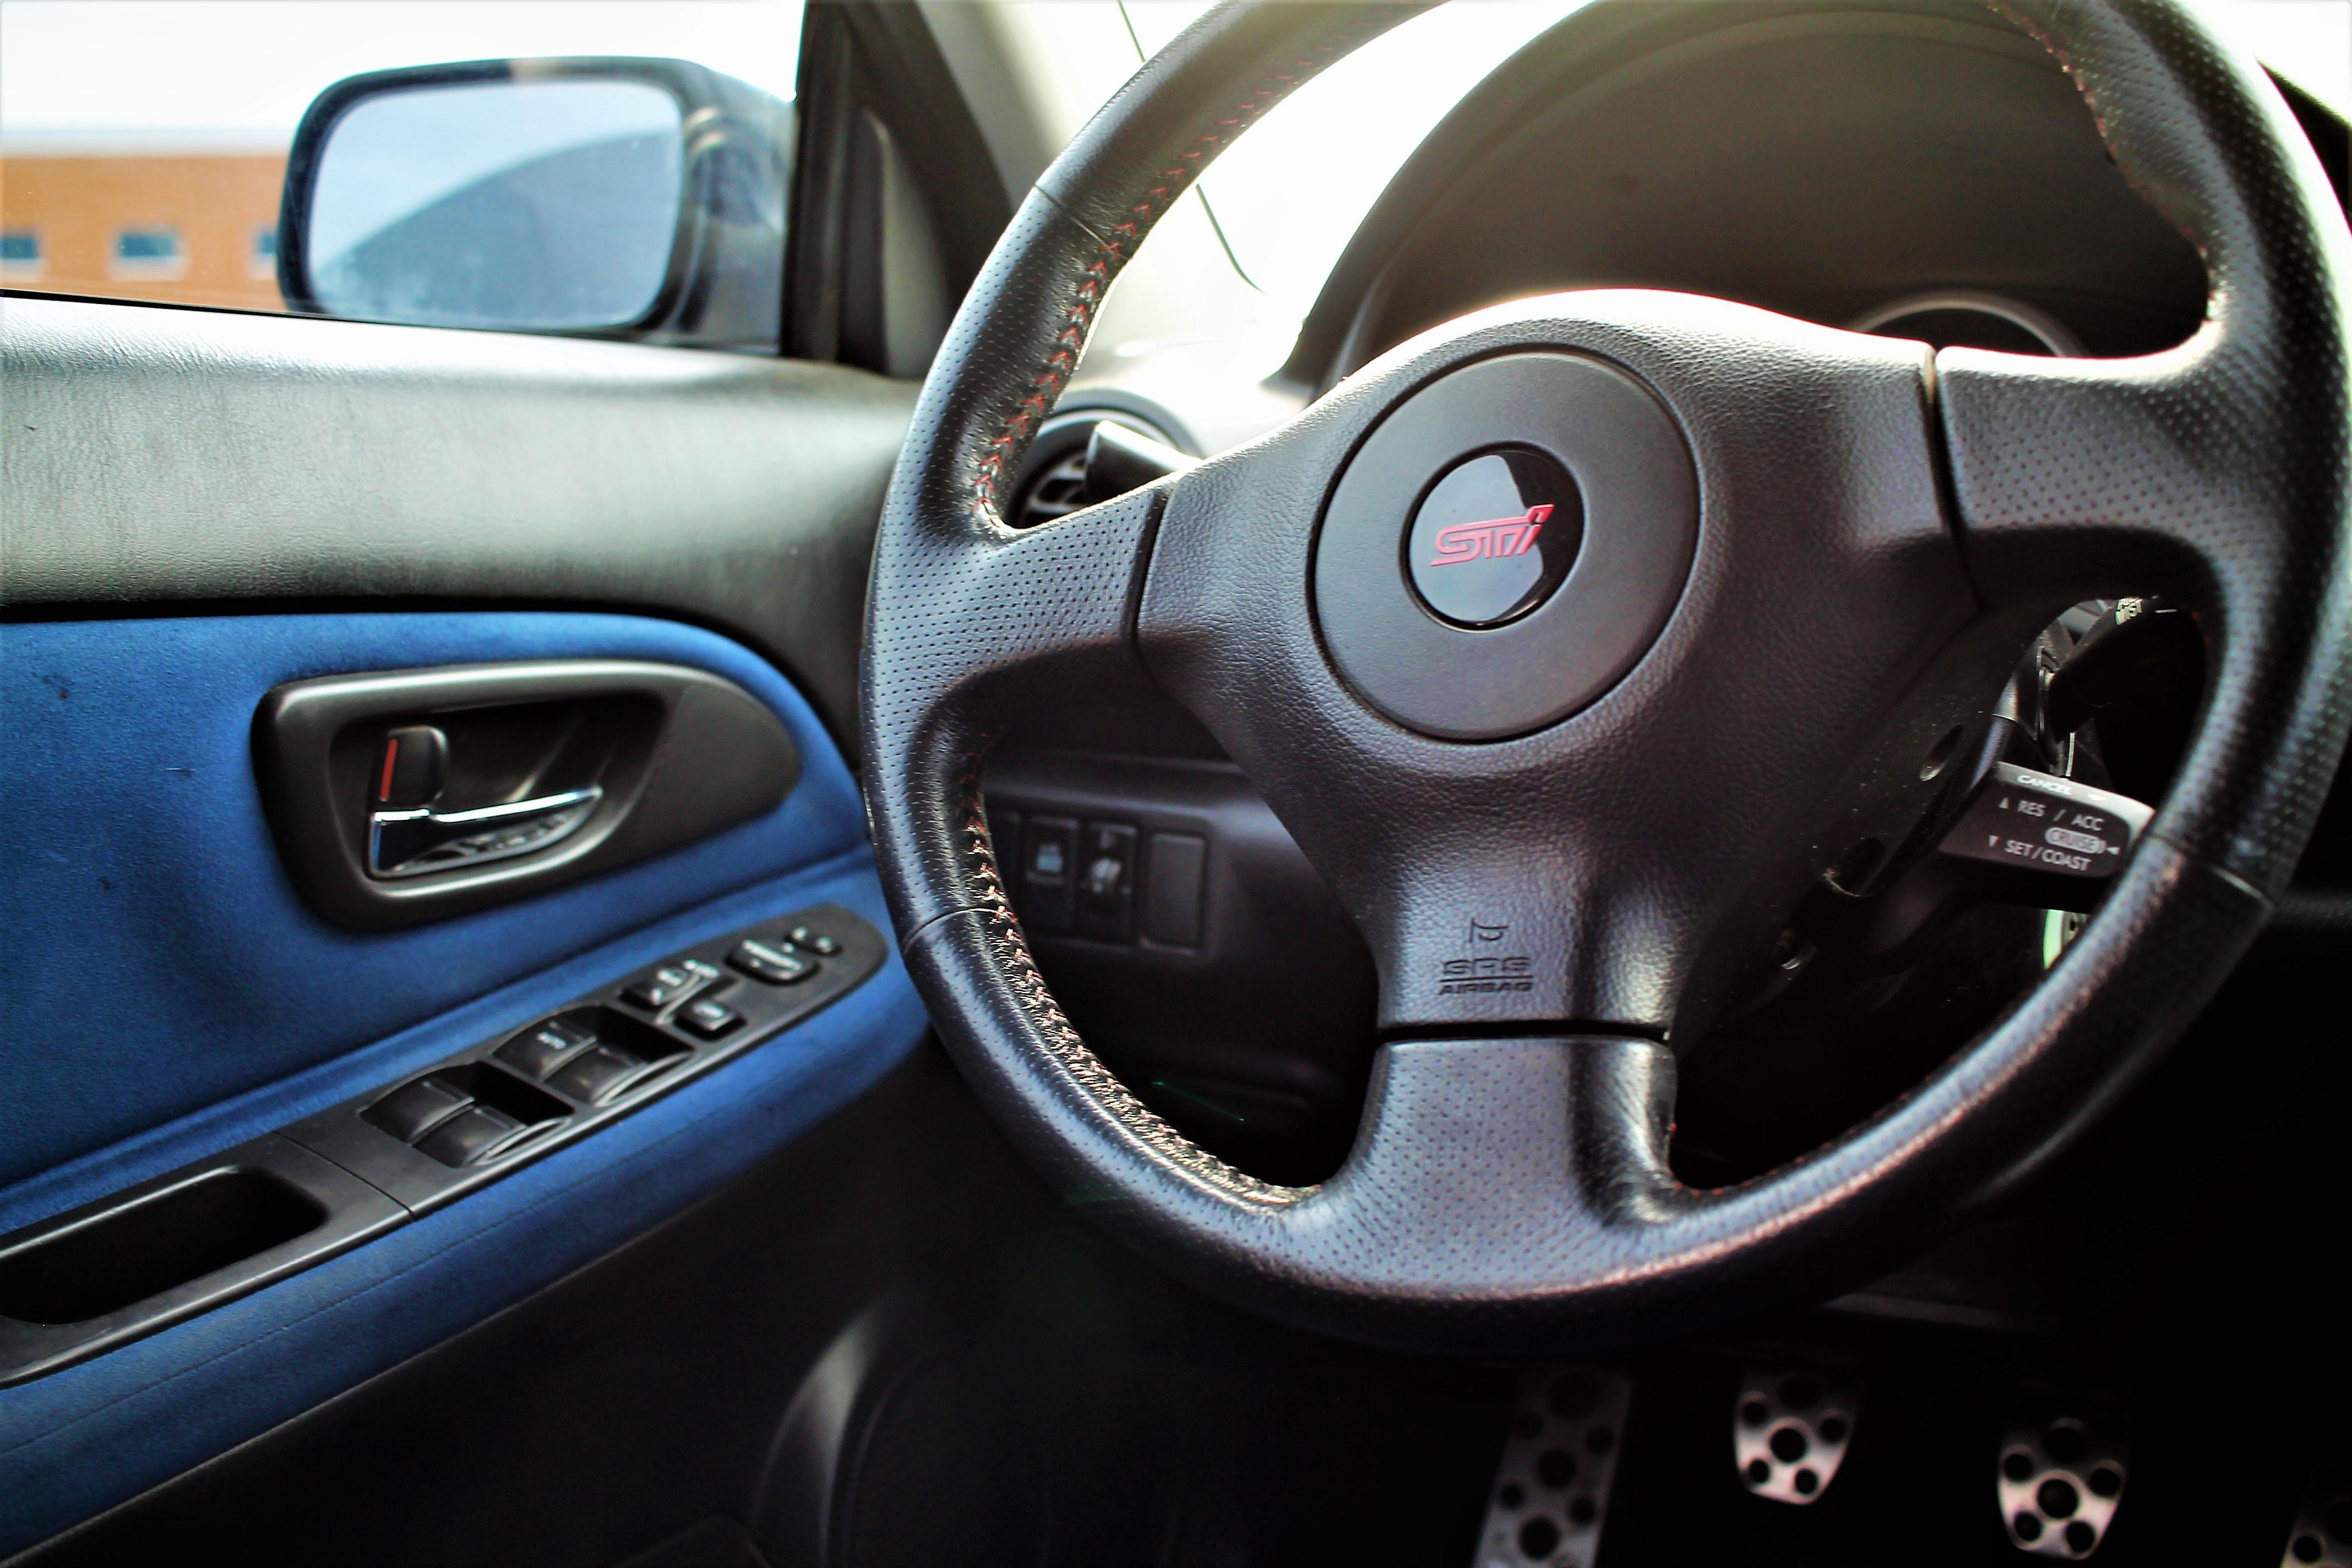 Free stock photo of auto, automotive, car, car interior